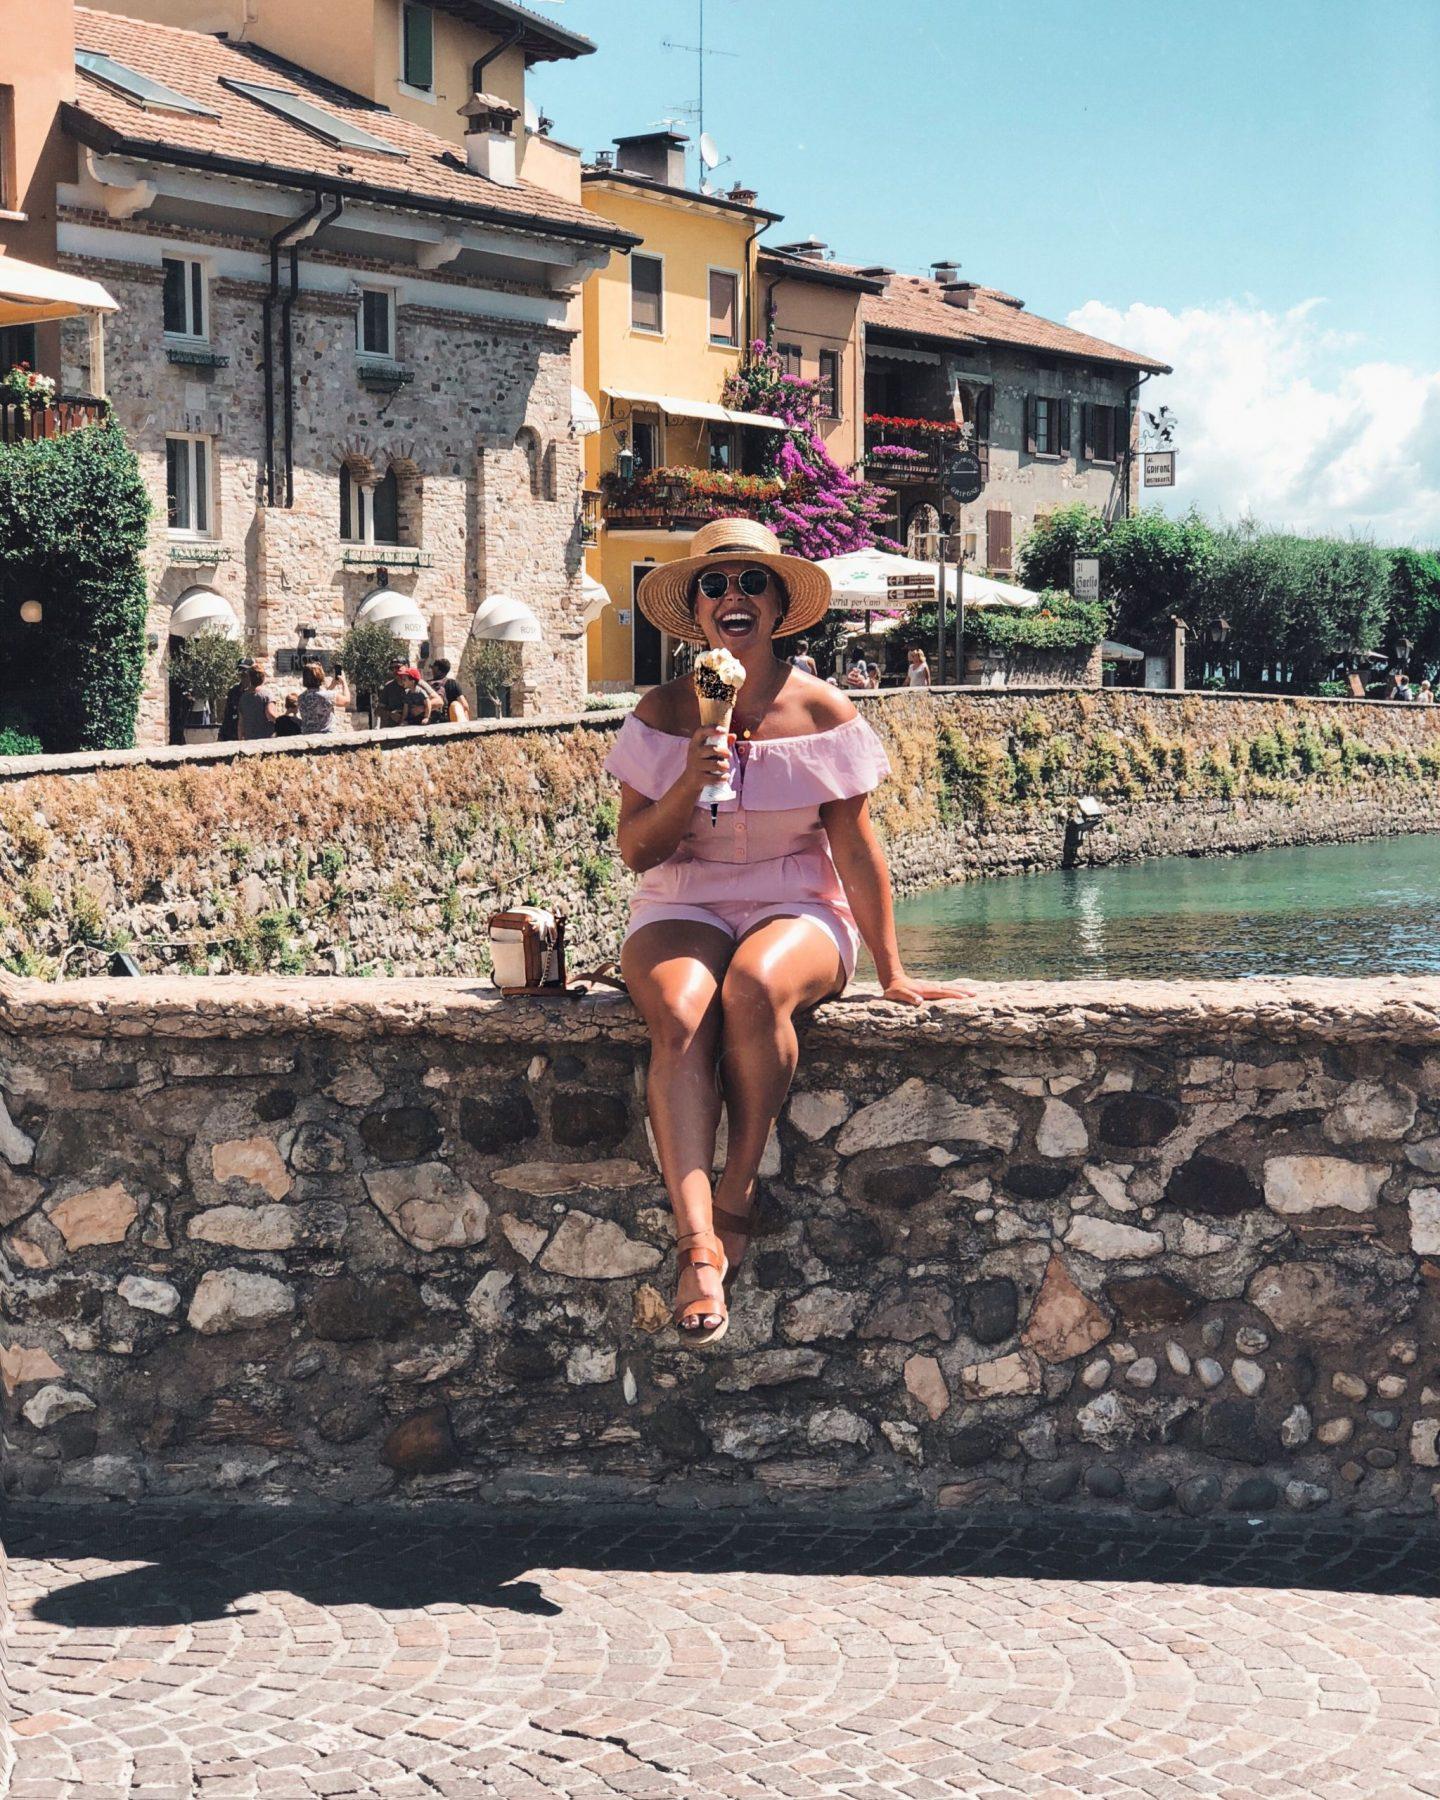 Gelato Lake Garda Guide Nadia El Ferdaoussi at Sirmione